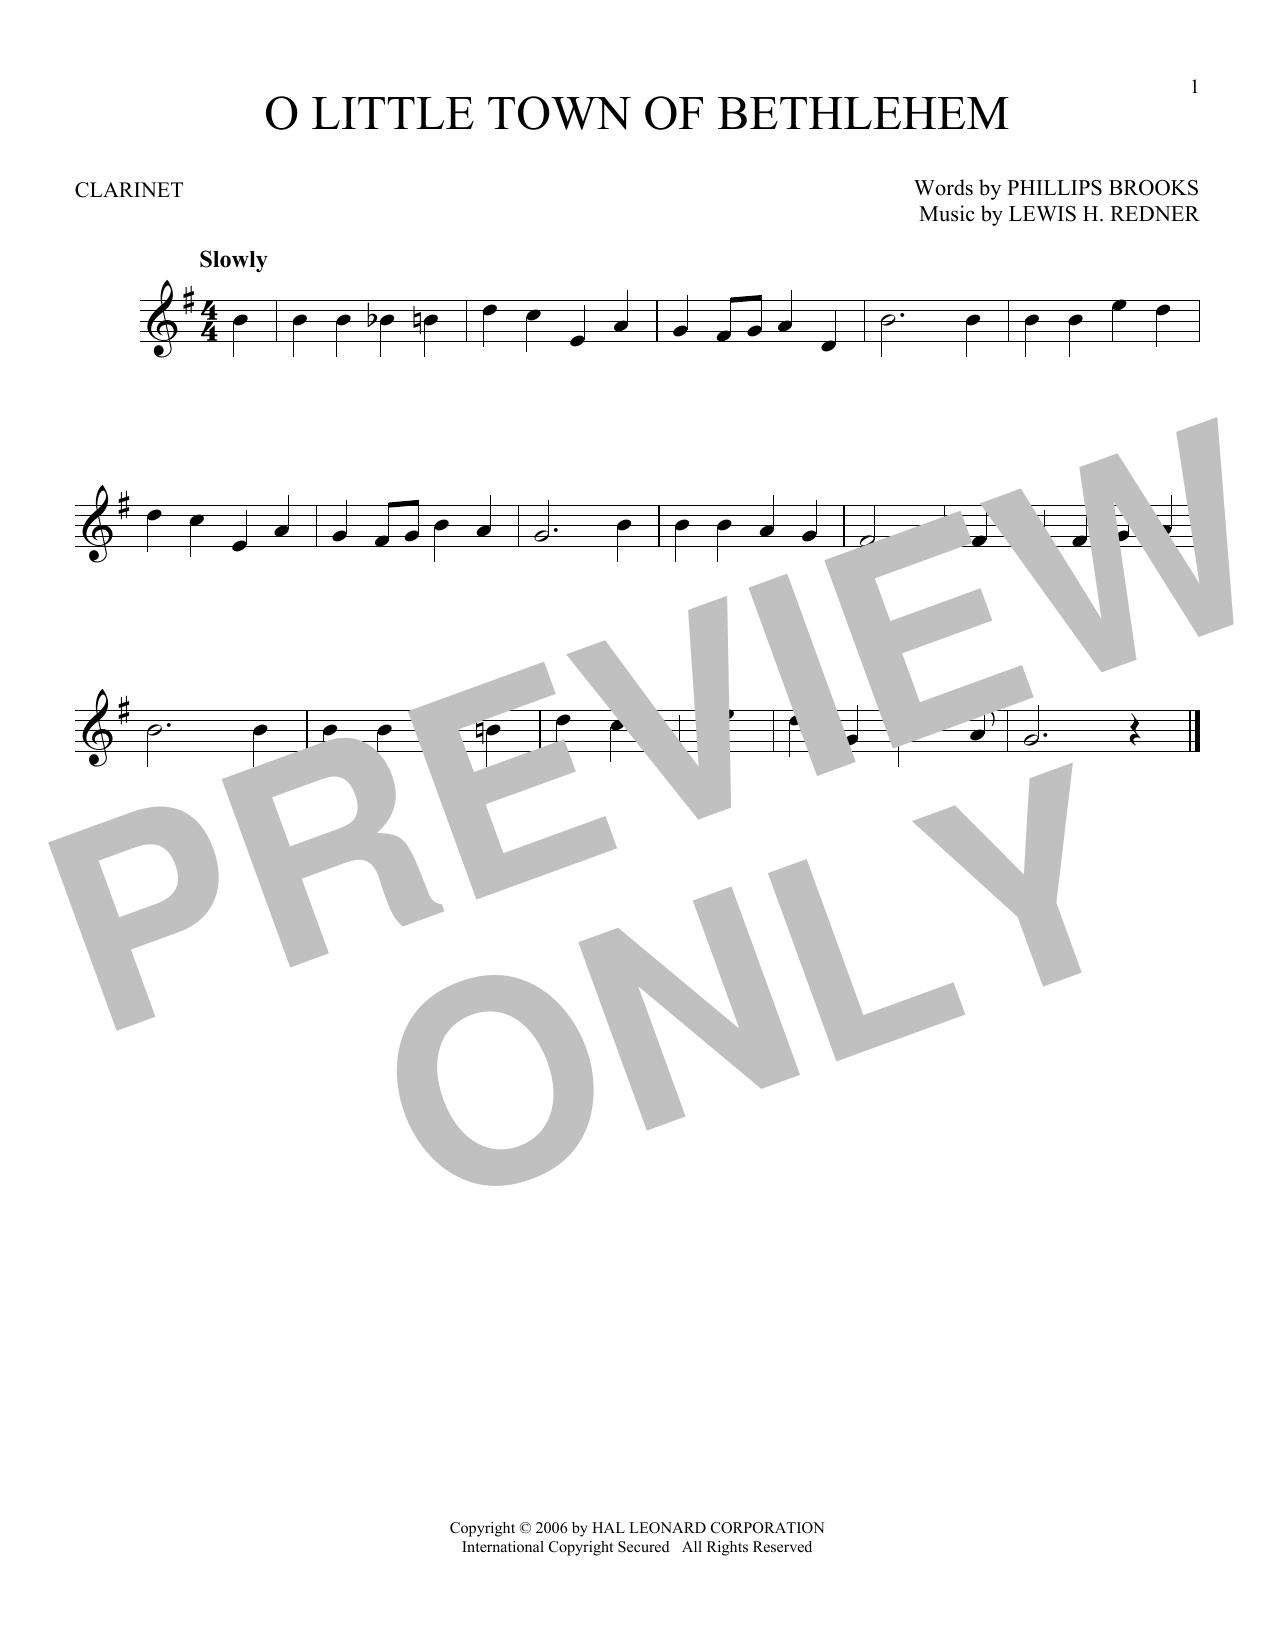 Partition clarinette O Little Town Of Bethlehem de Phillips Brooks - Clarinette